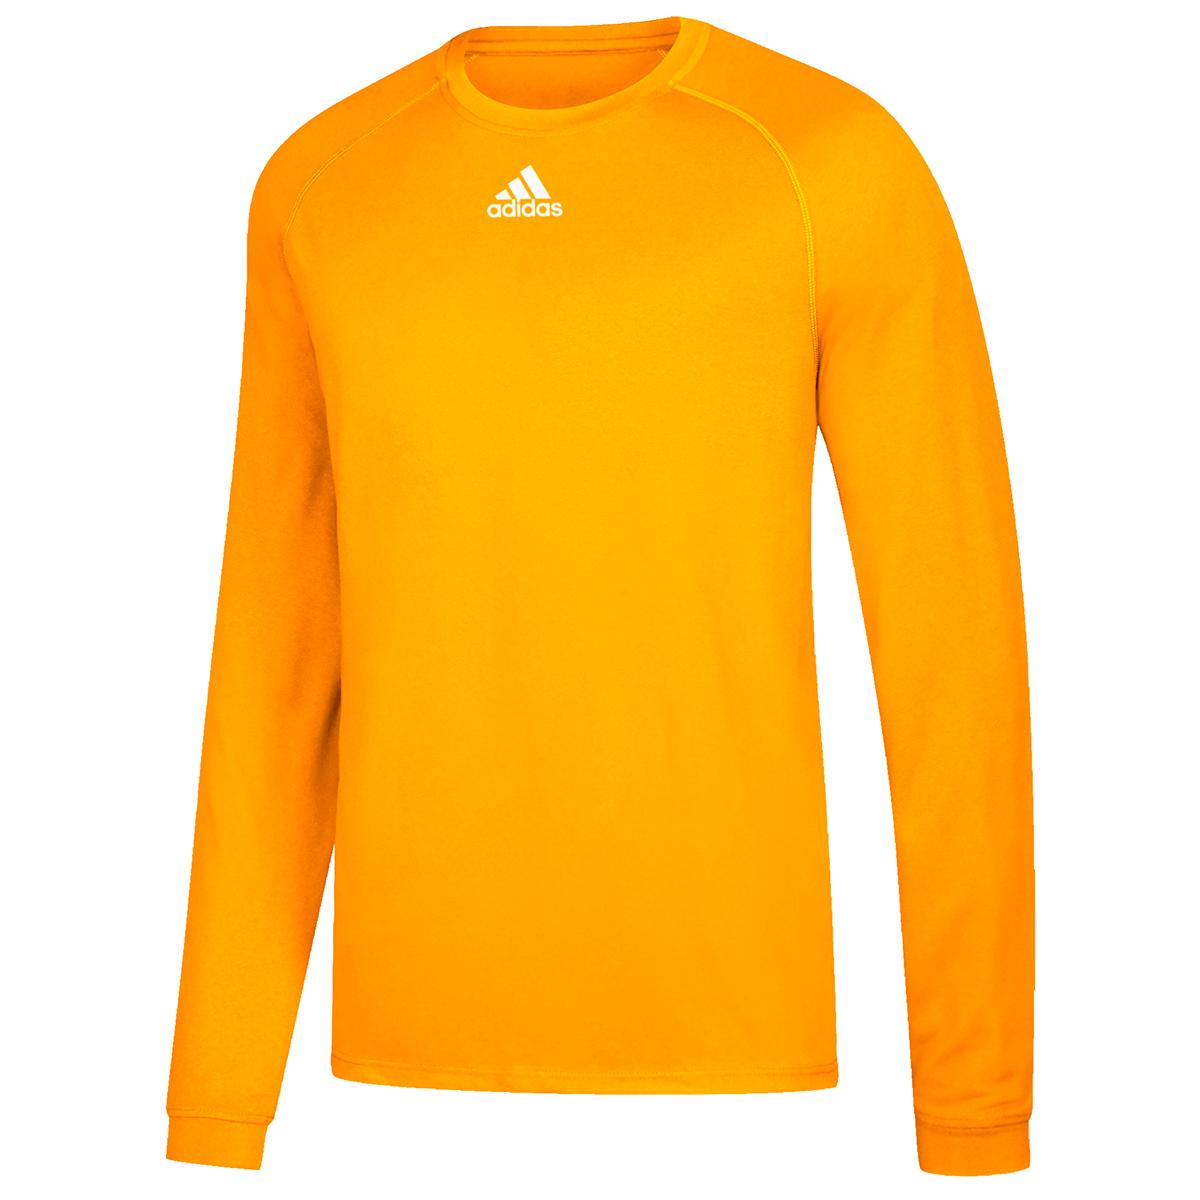 Adidas Men's Climalite Long-Sleeve Tee - Yellow, XS